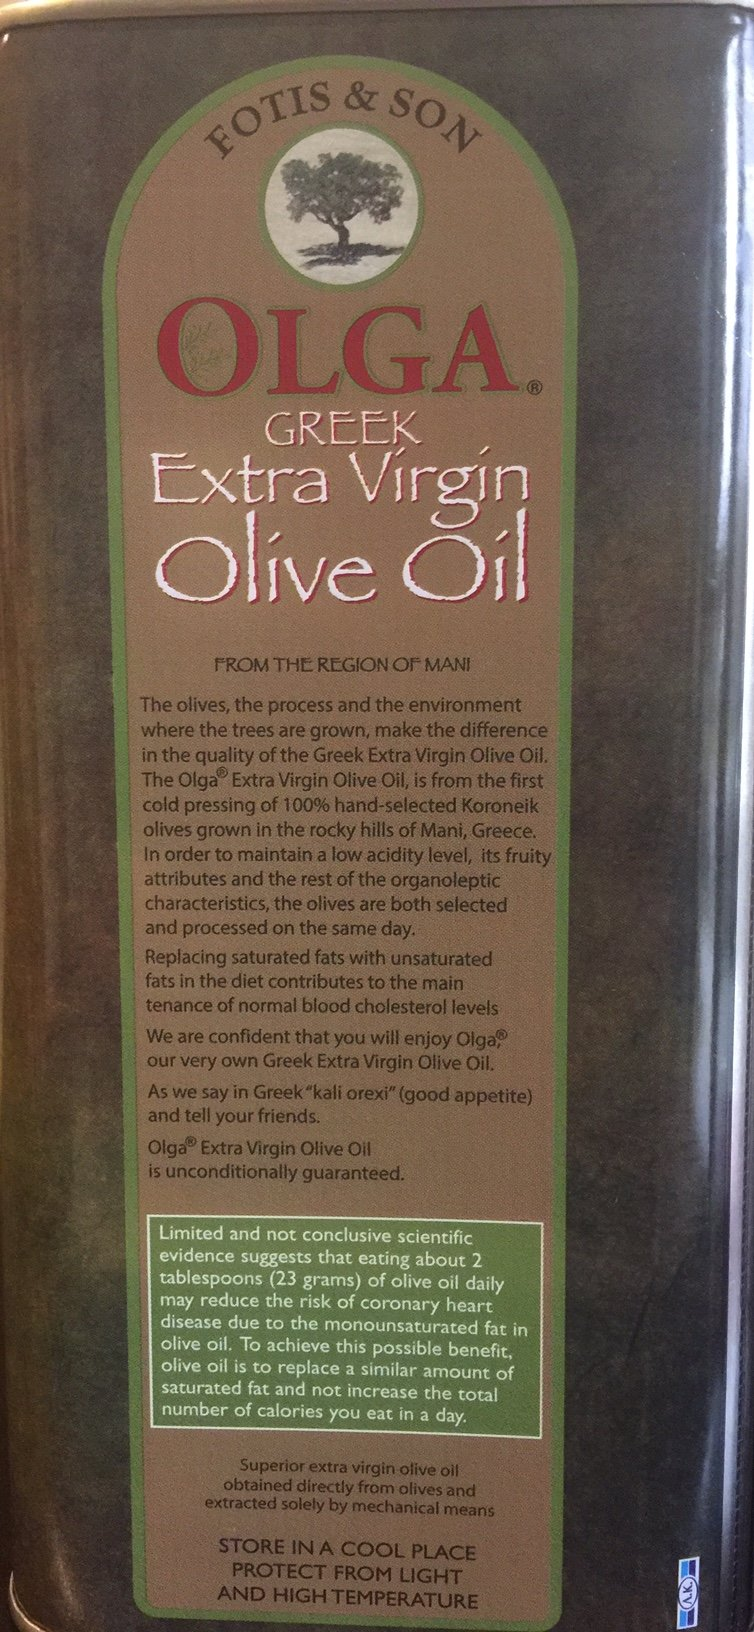 Greek Extra Virgin Olive oil Olga Brand 3 liter by Olga Extra Virgin Olive oil (Image #2)